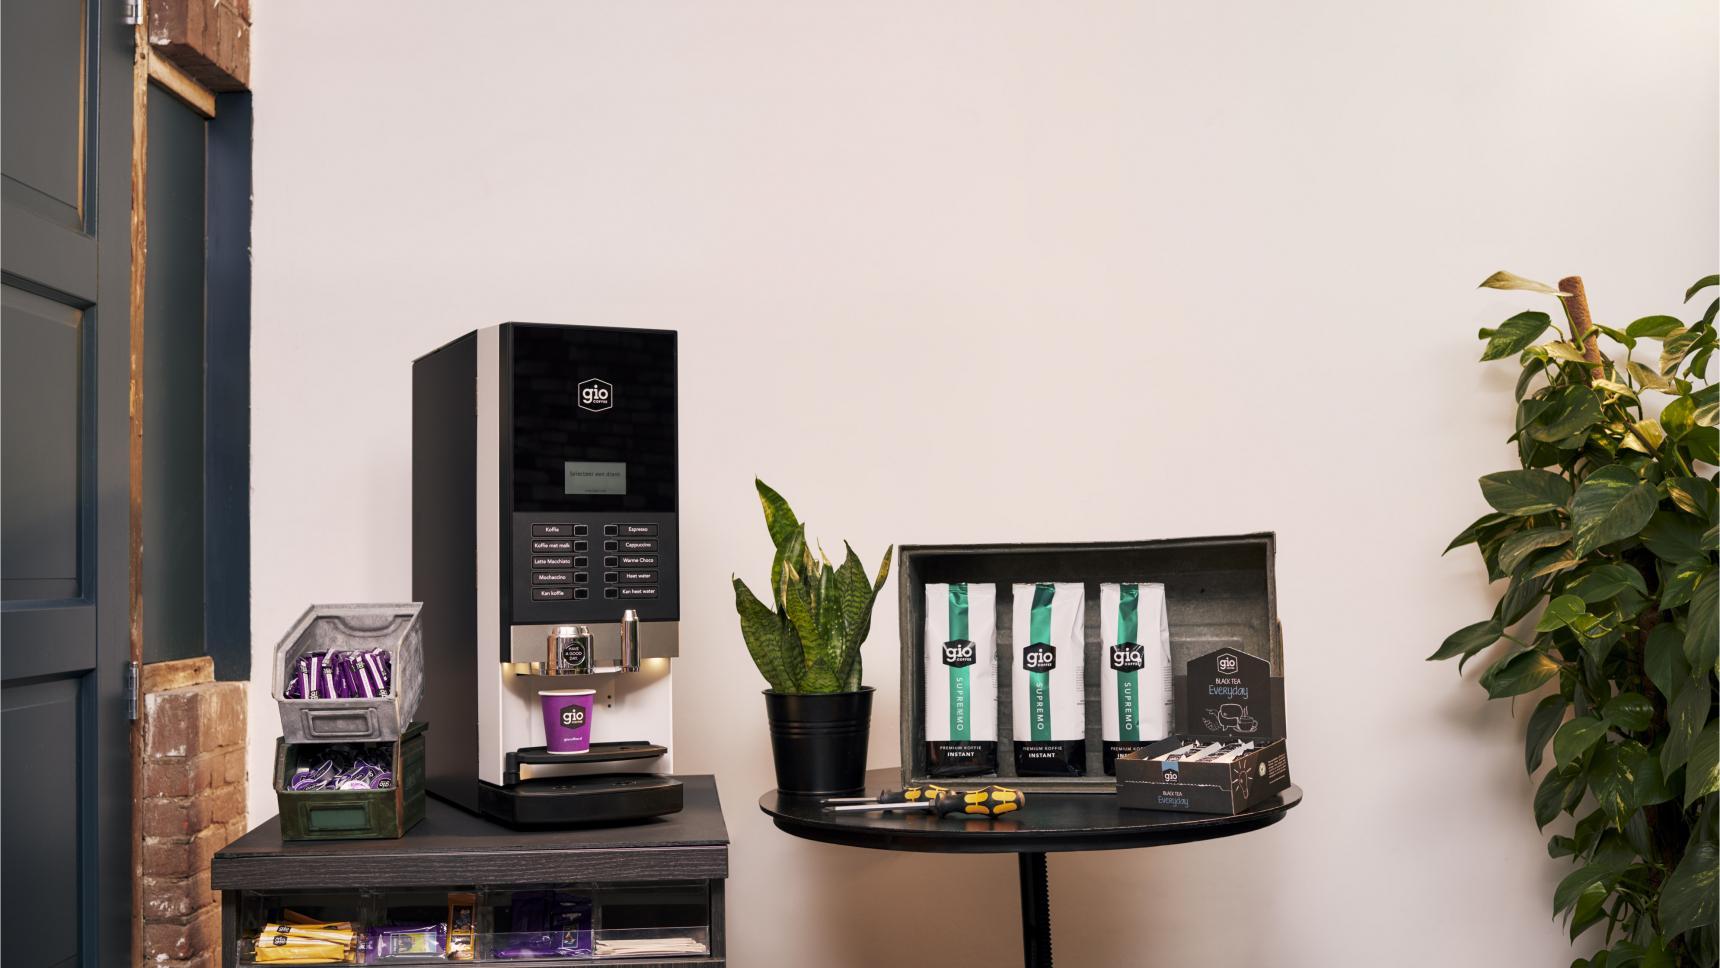 Gio Coffee Instant koffiemachine in fabriekssetting